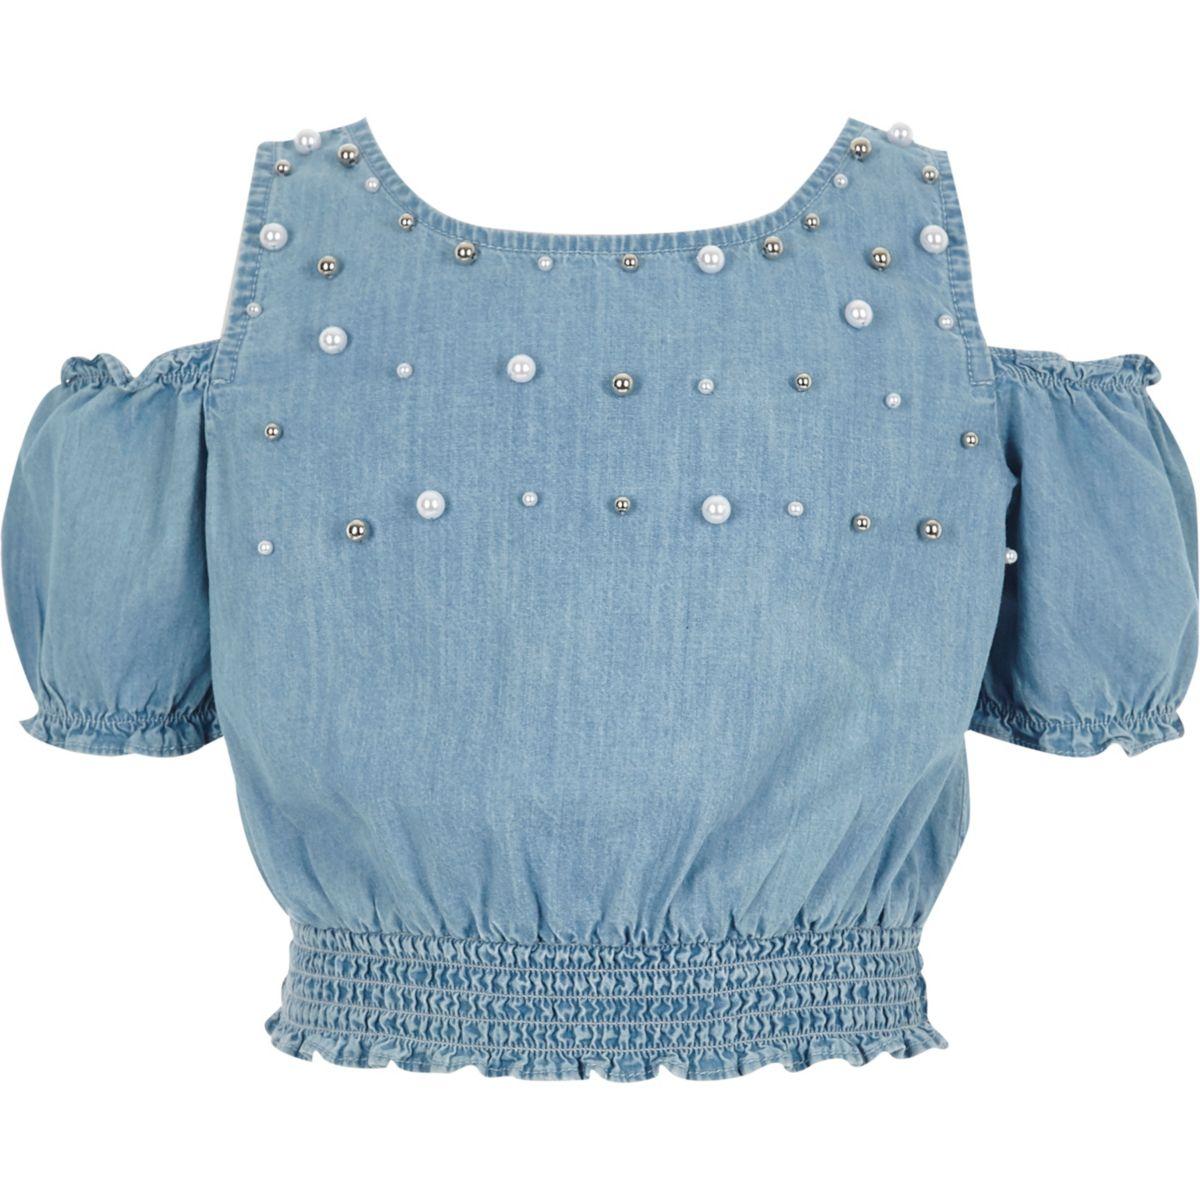 Blaues, perlenverziertes Jeansoberteil